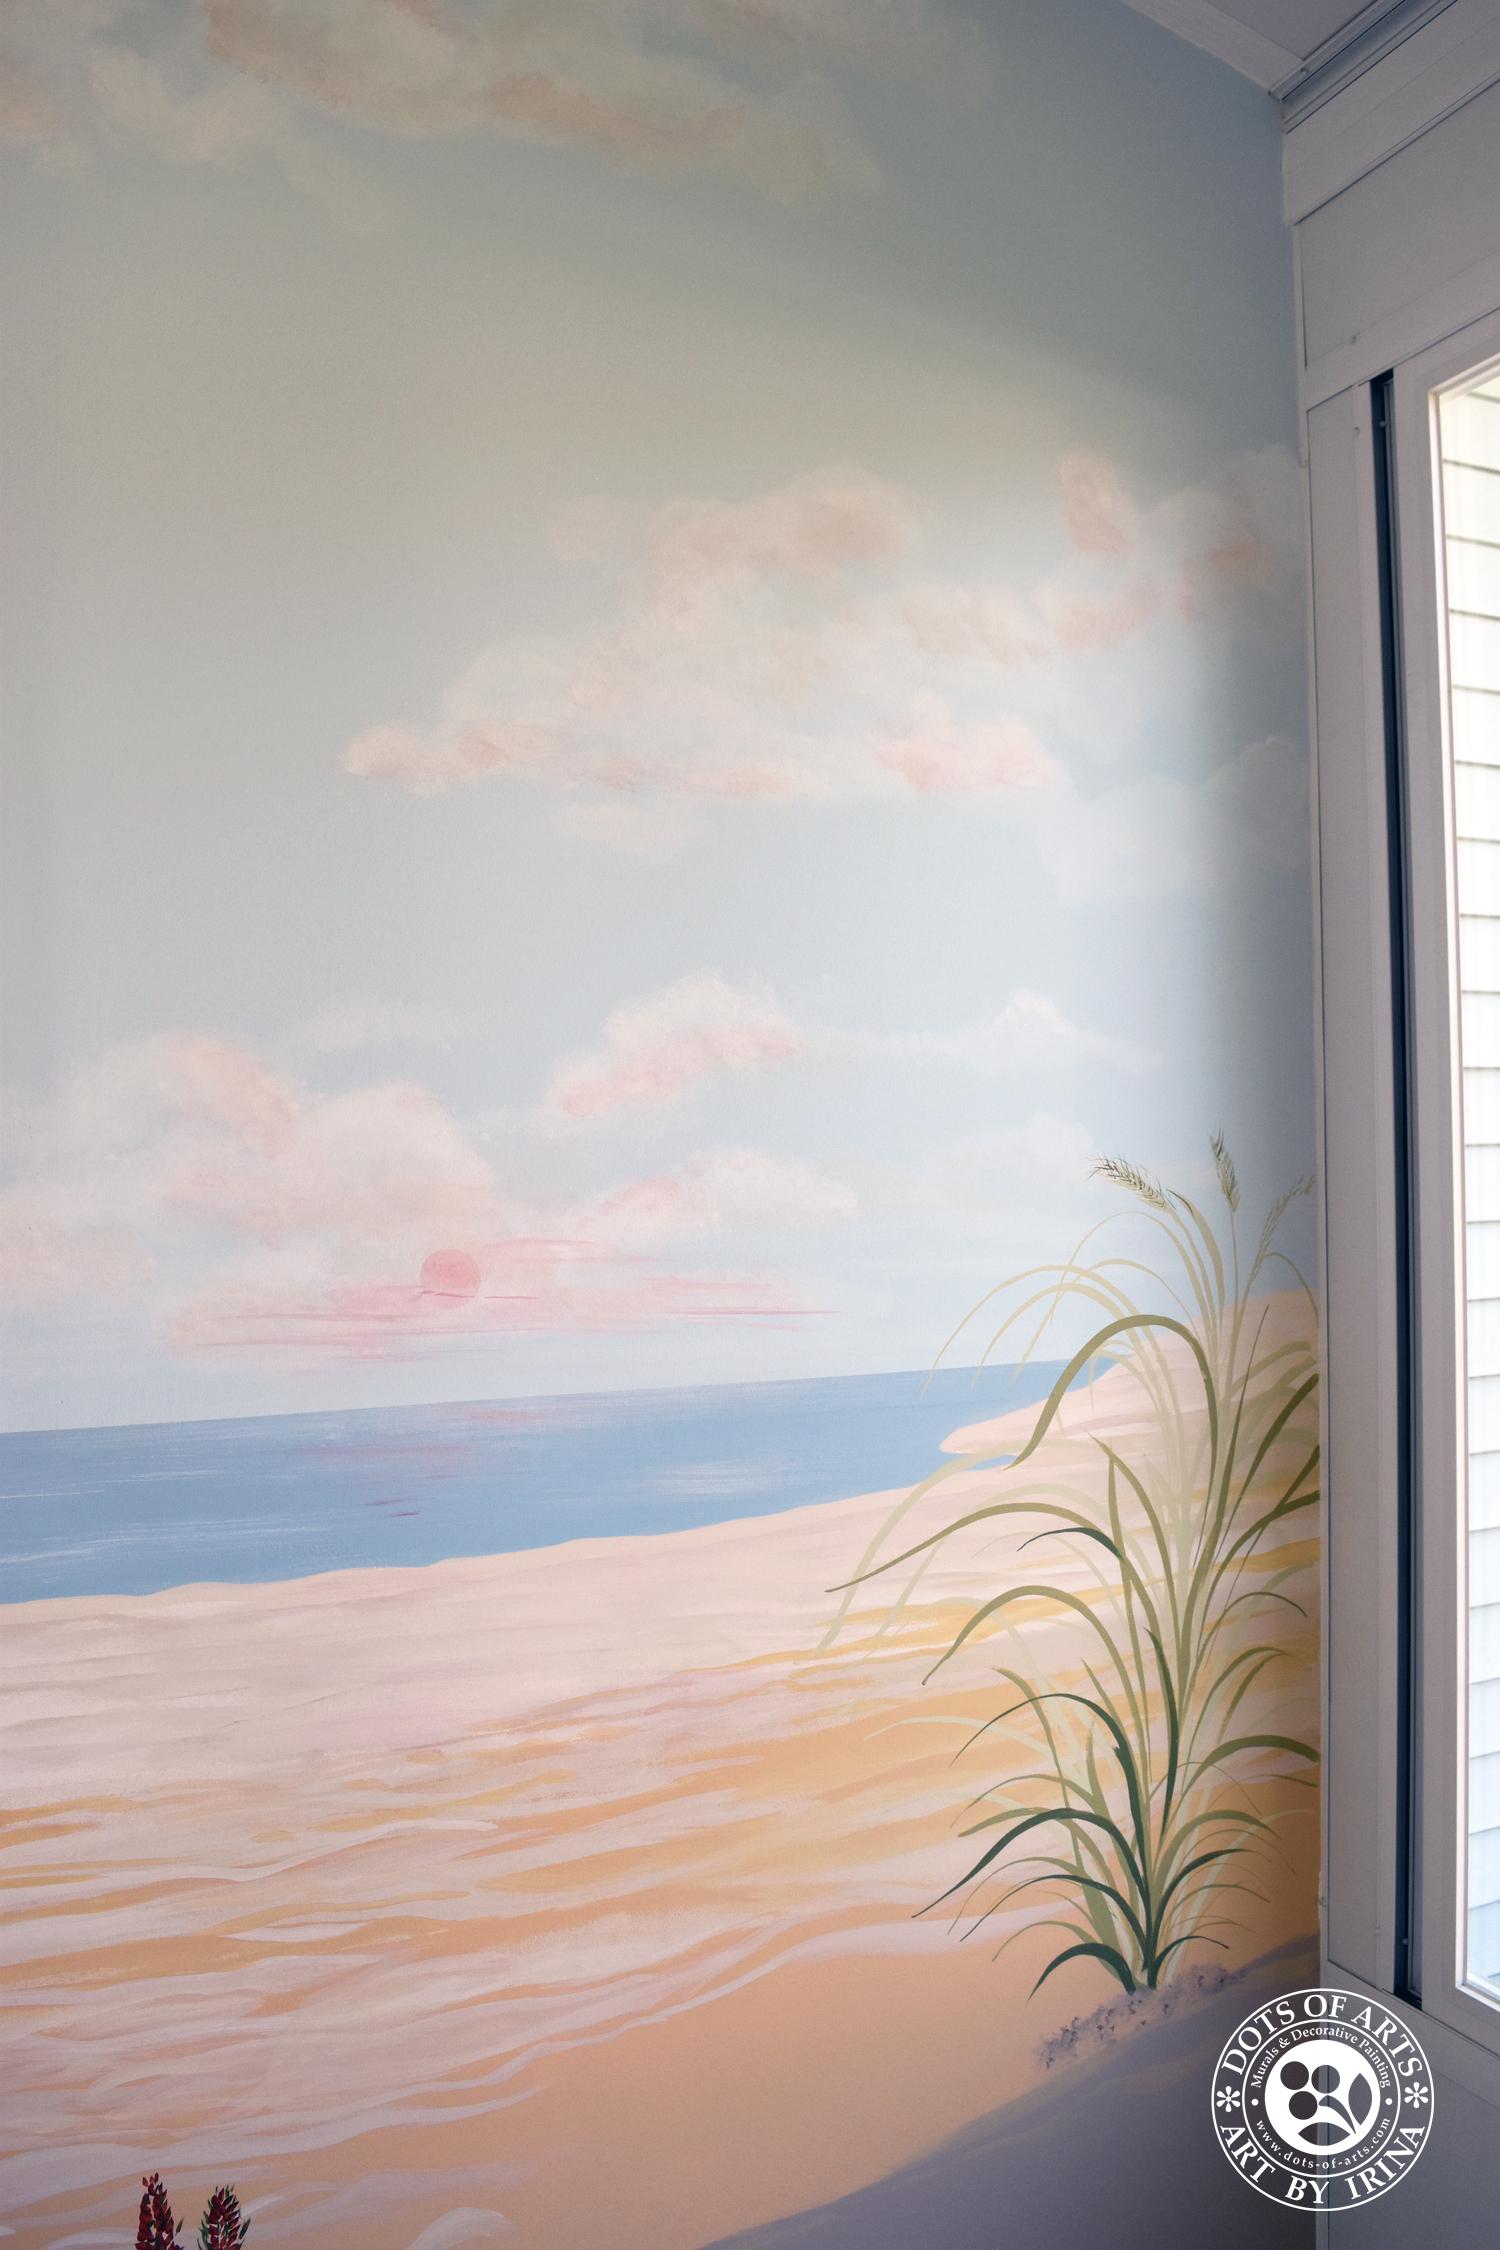 florida-room-mural-full-room-dots-of-arts-details.jpg